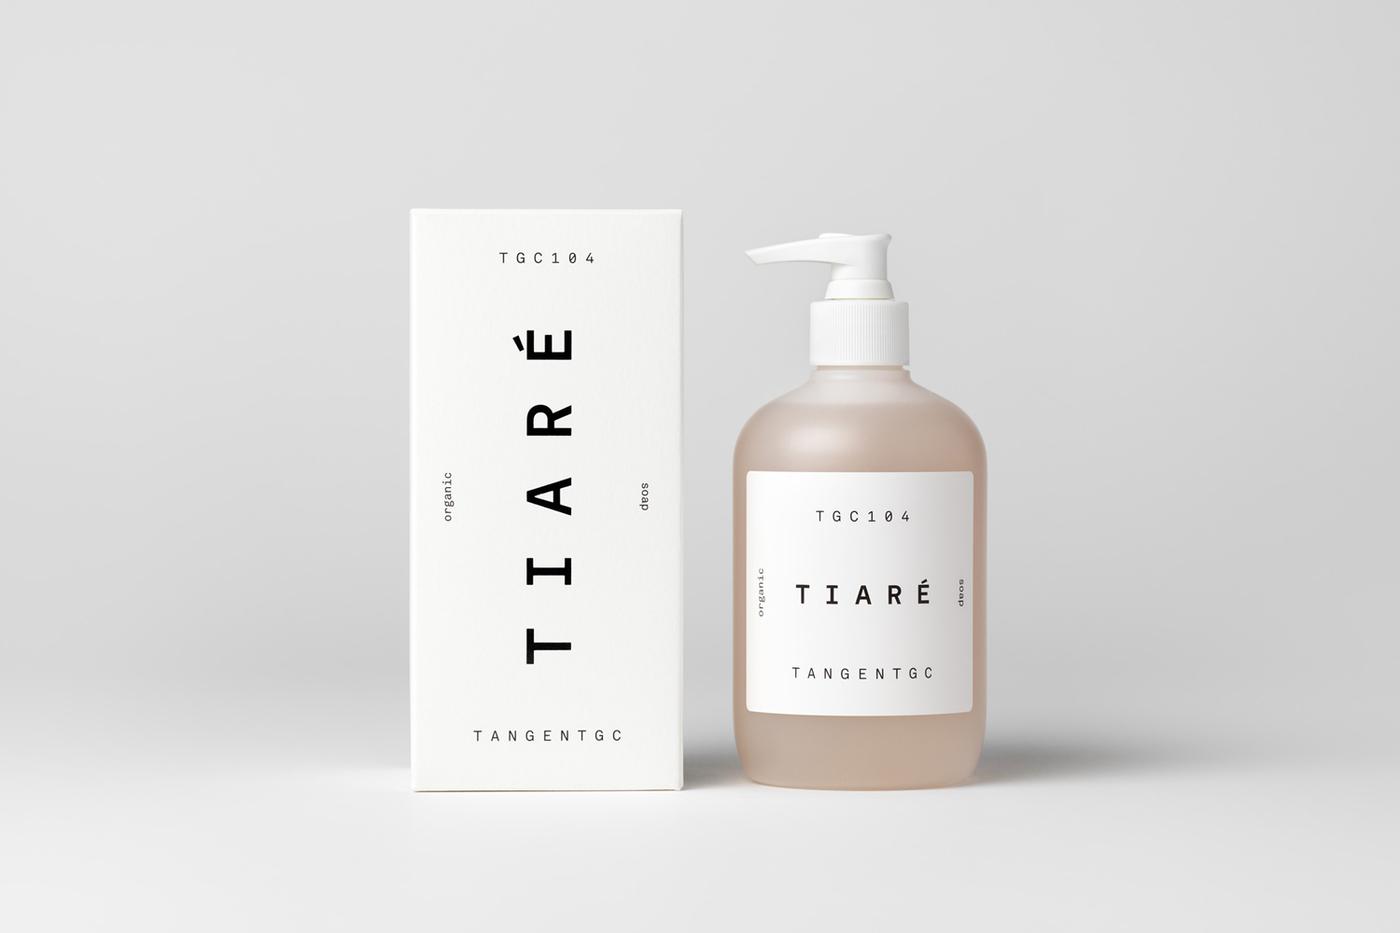 01-Tangent-GC-Soap-Packaging-Carl-Nas-Associates-London-UK-BPO.jpeg